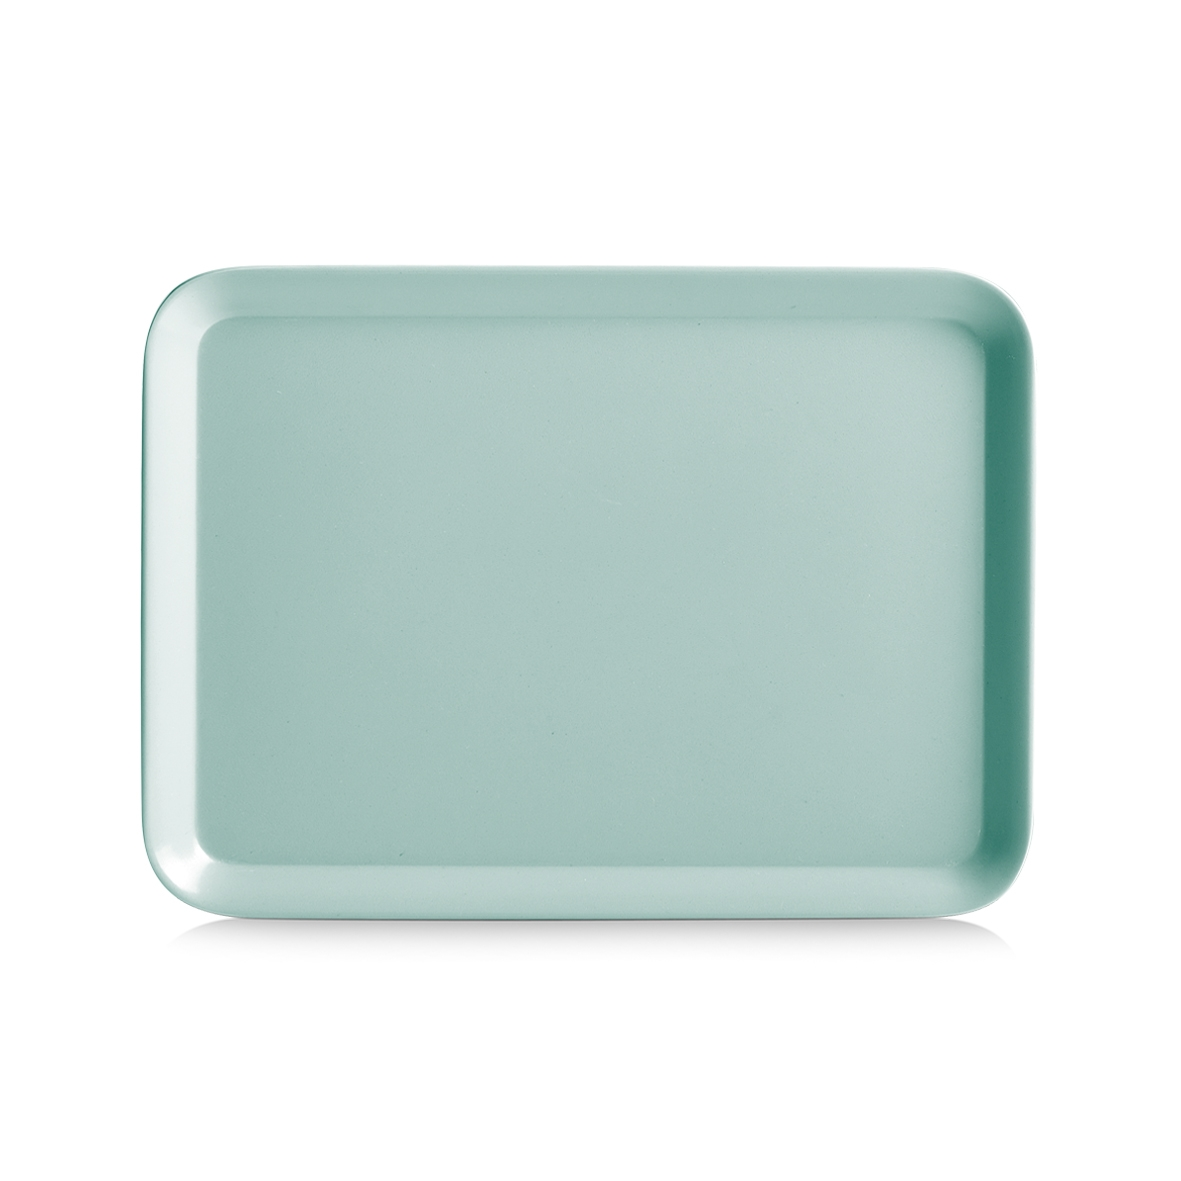 Tava pentru servire Aqua II, Melamina, l24xA18 cm-Verde Mint imagine